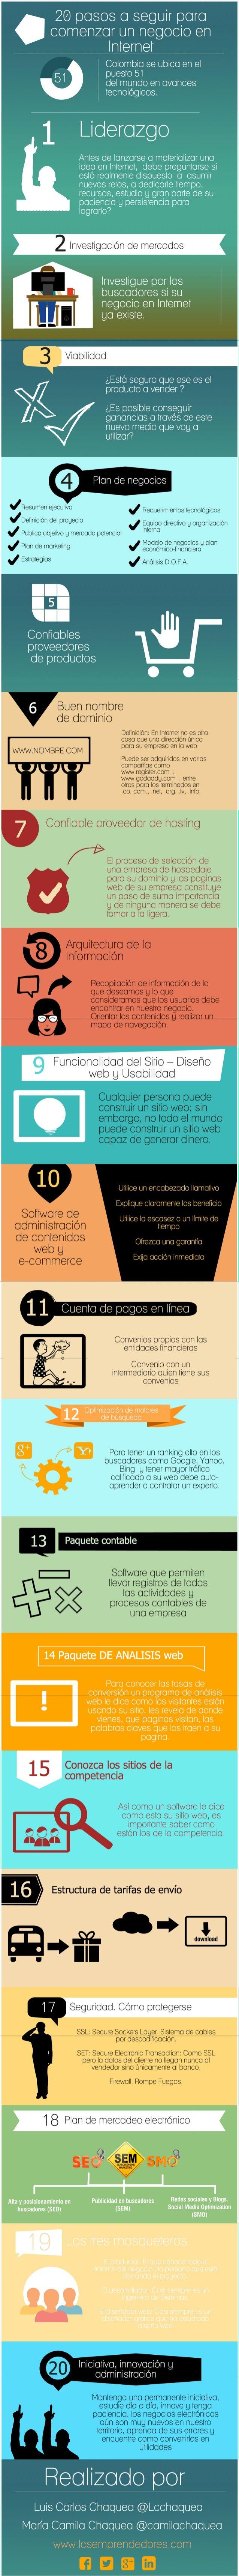 Infografía 20 pasos a seguir para comenzar un negocio en Internet  by Luis Chaquea via slideshare